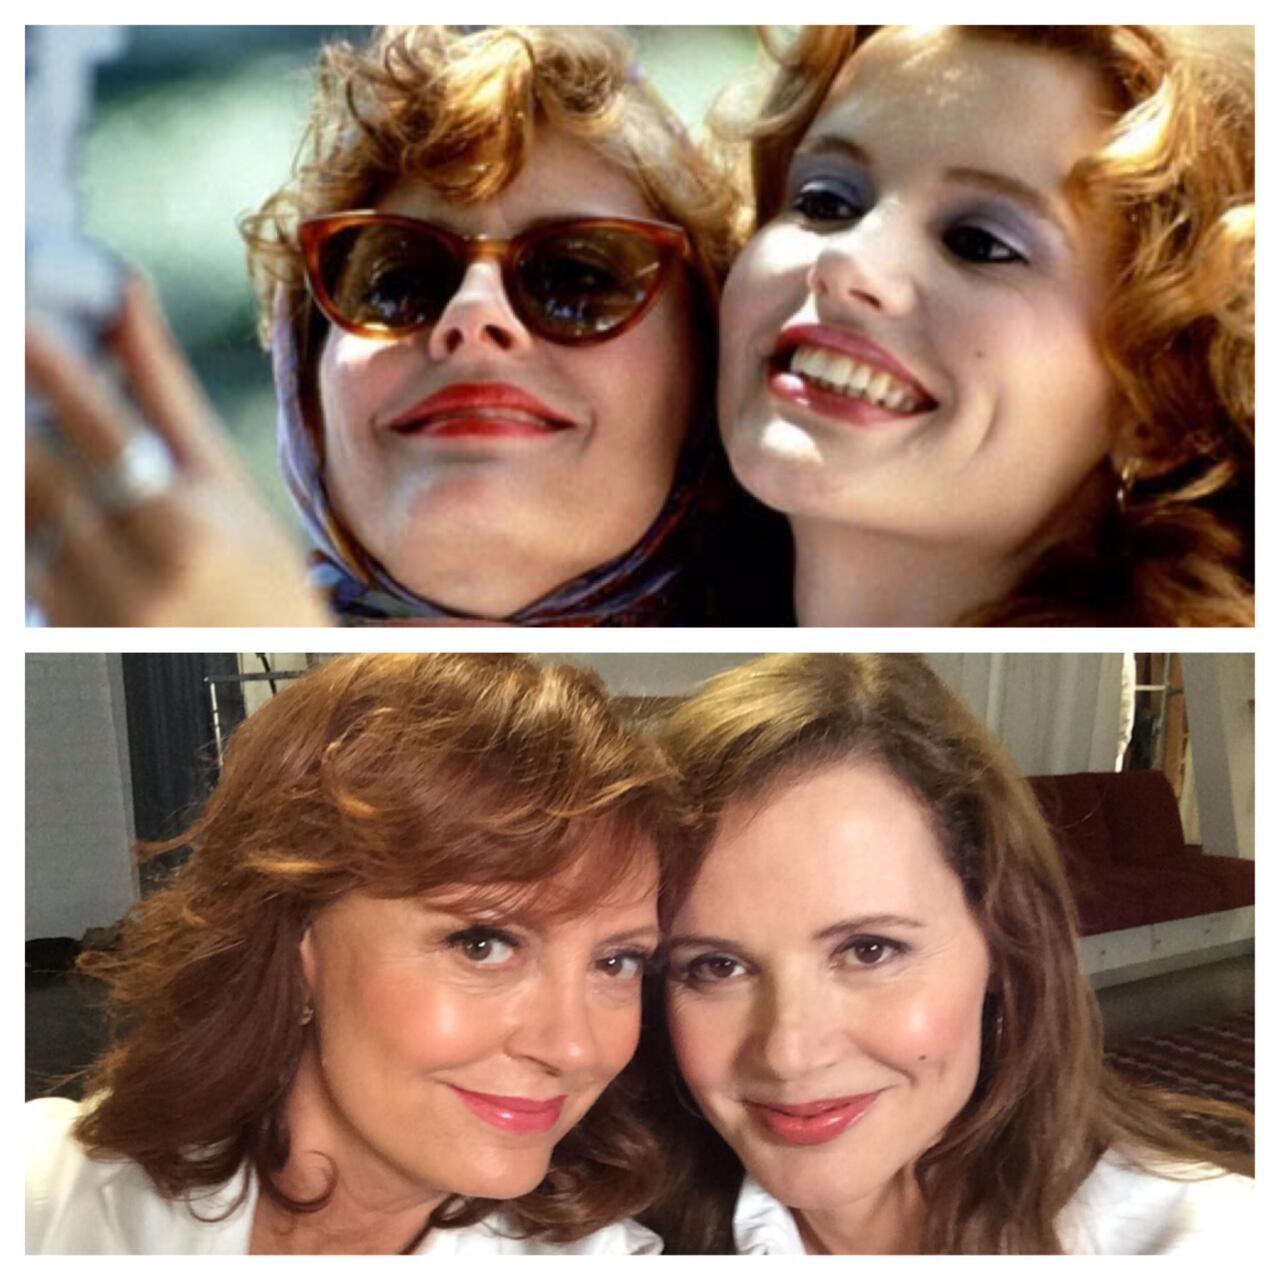 RT @SusanSarandon: Inventors of the #selfie at it again. #ThelmaAndLouise http://t.co/1yvbF8j4fF